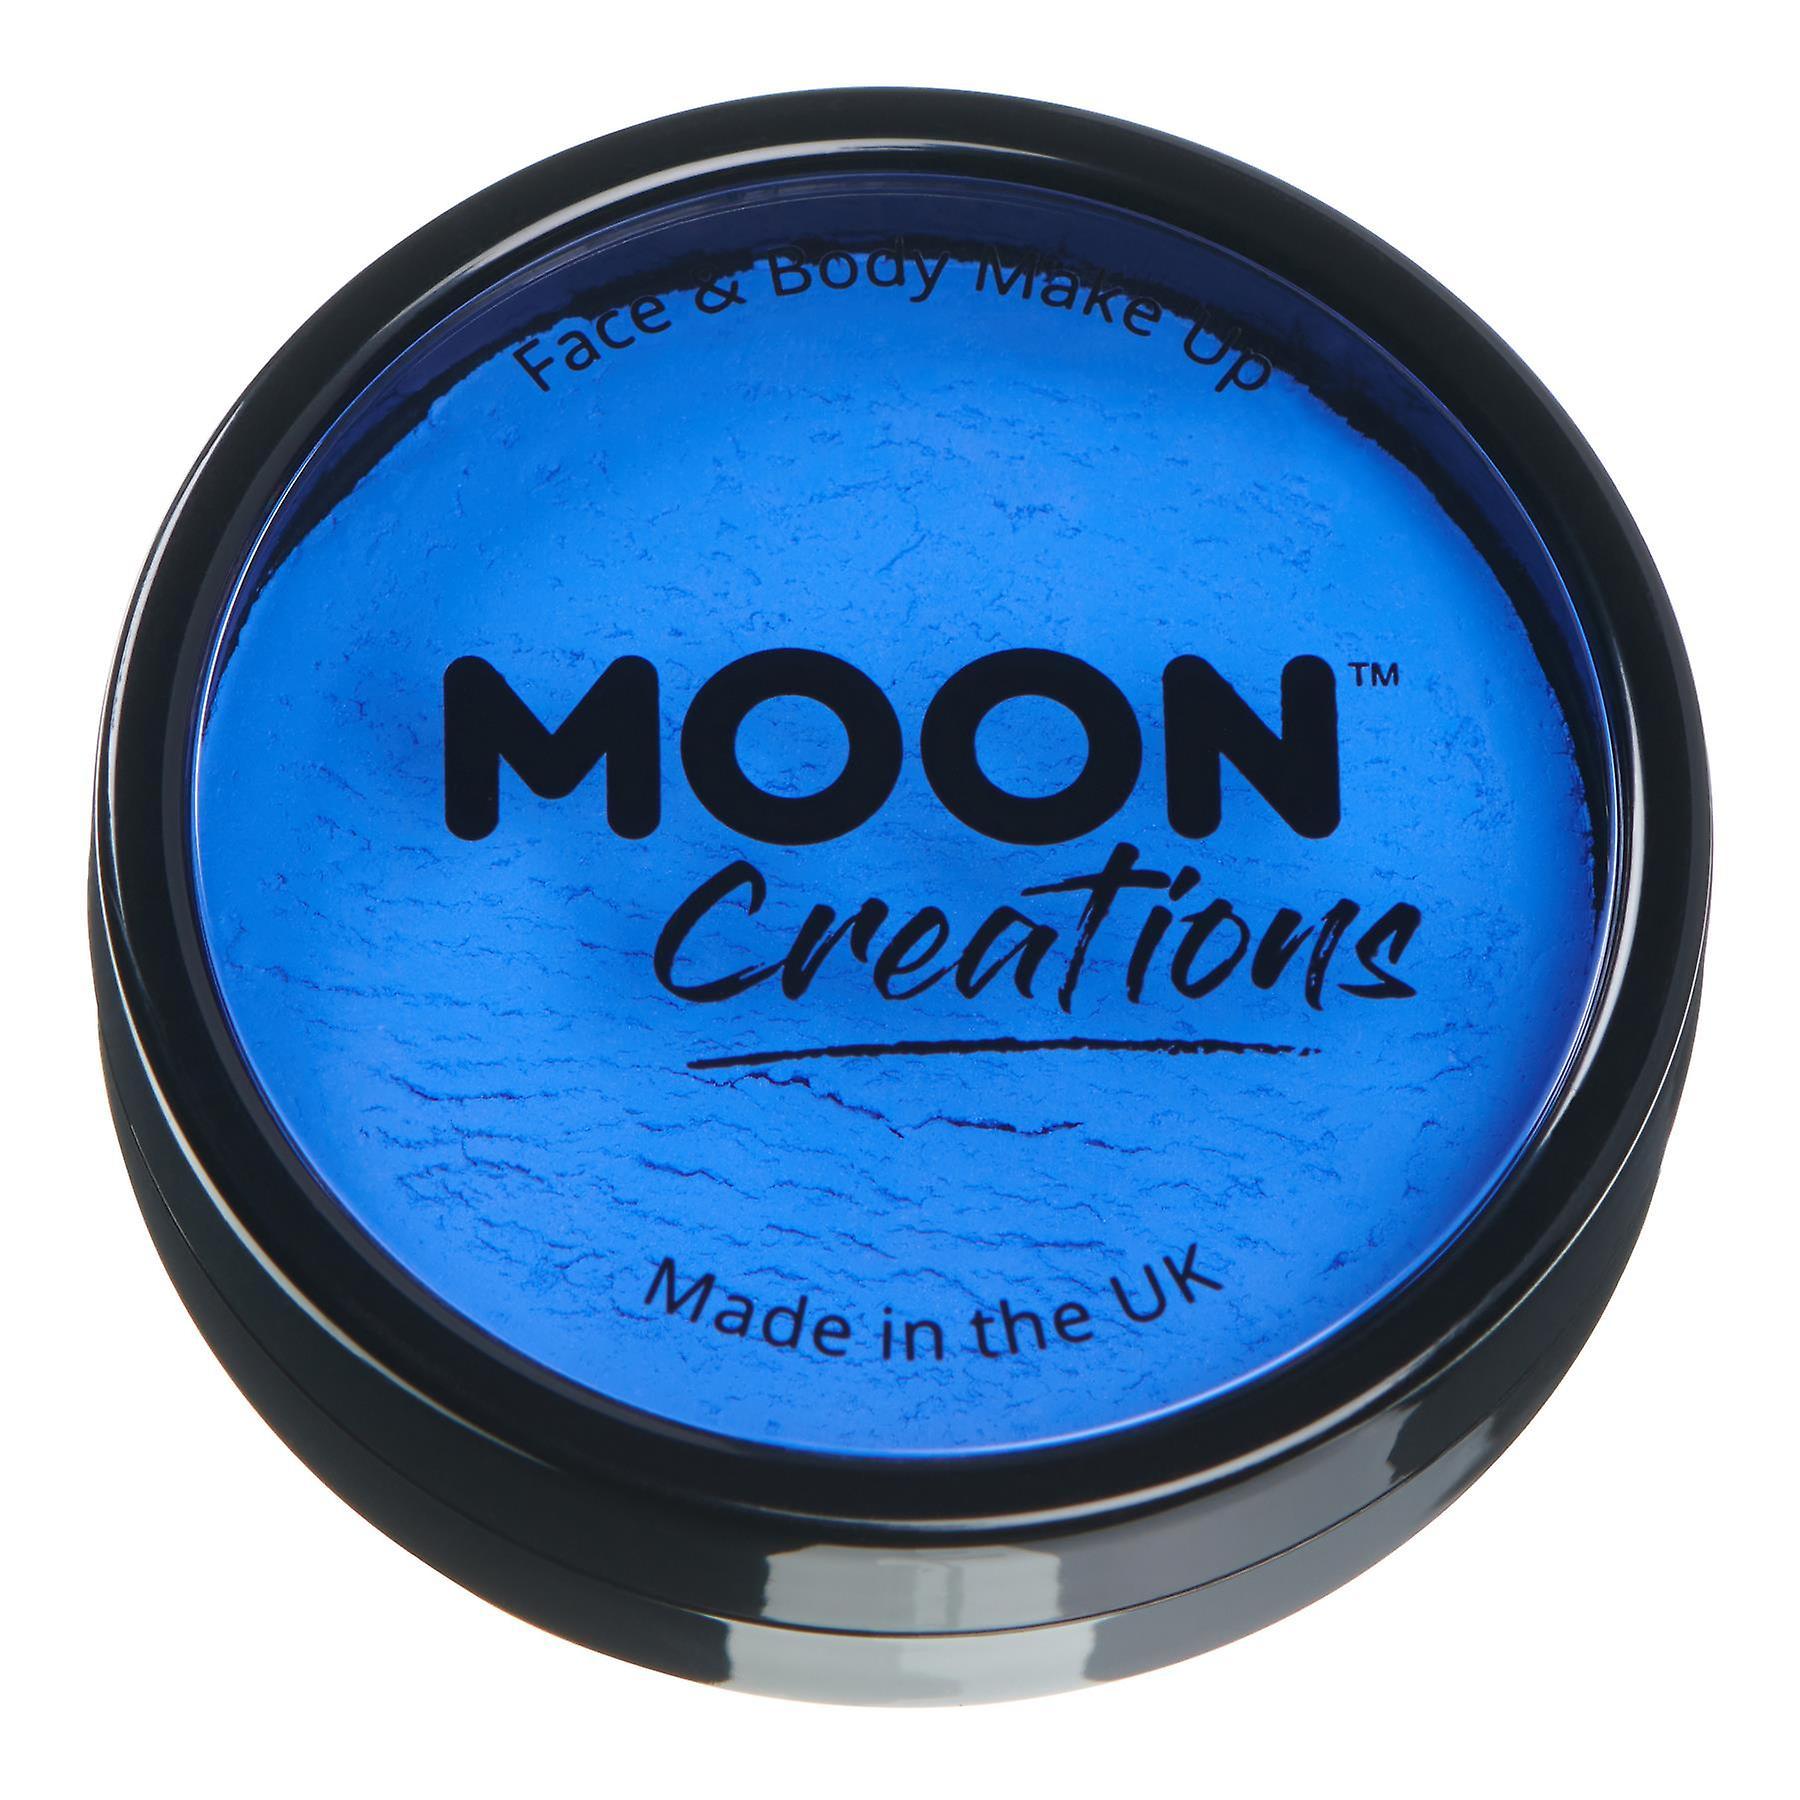 Moon Creations - Pro Face & Body Paint Cake Pots - Royal Blue